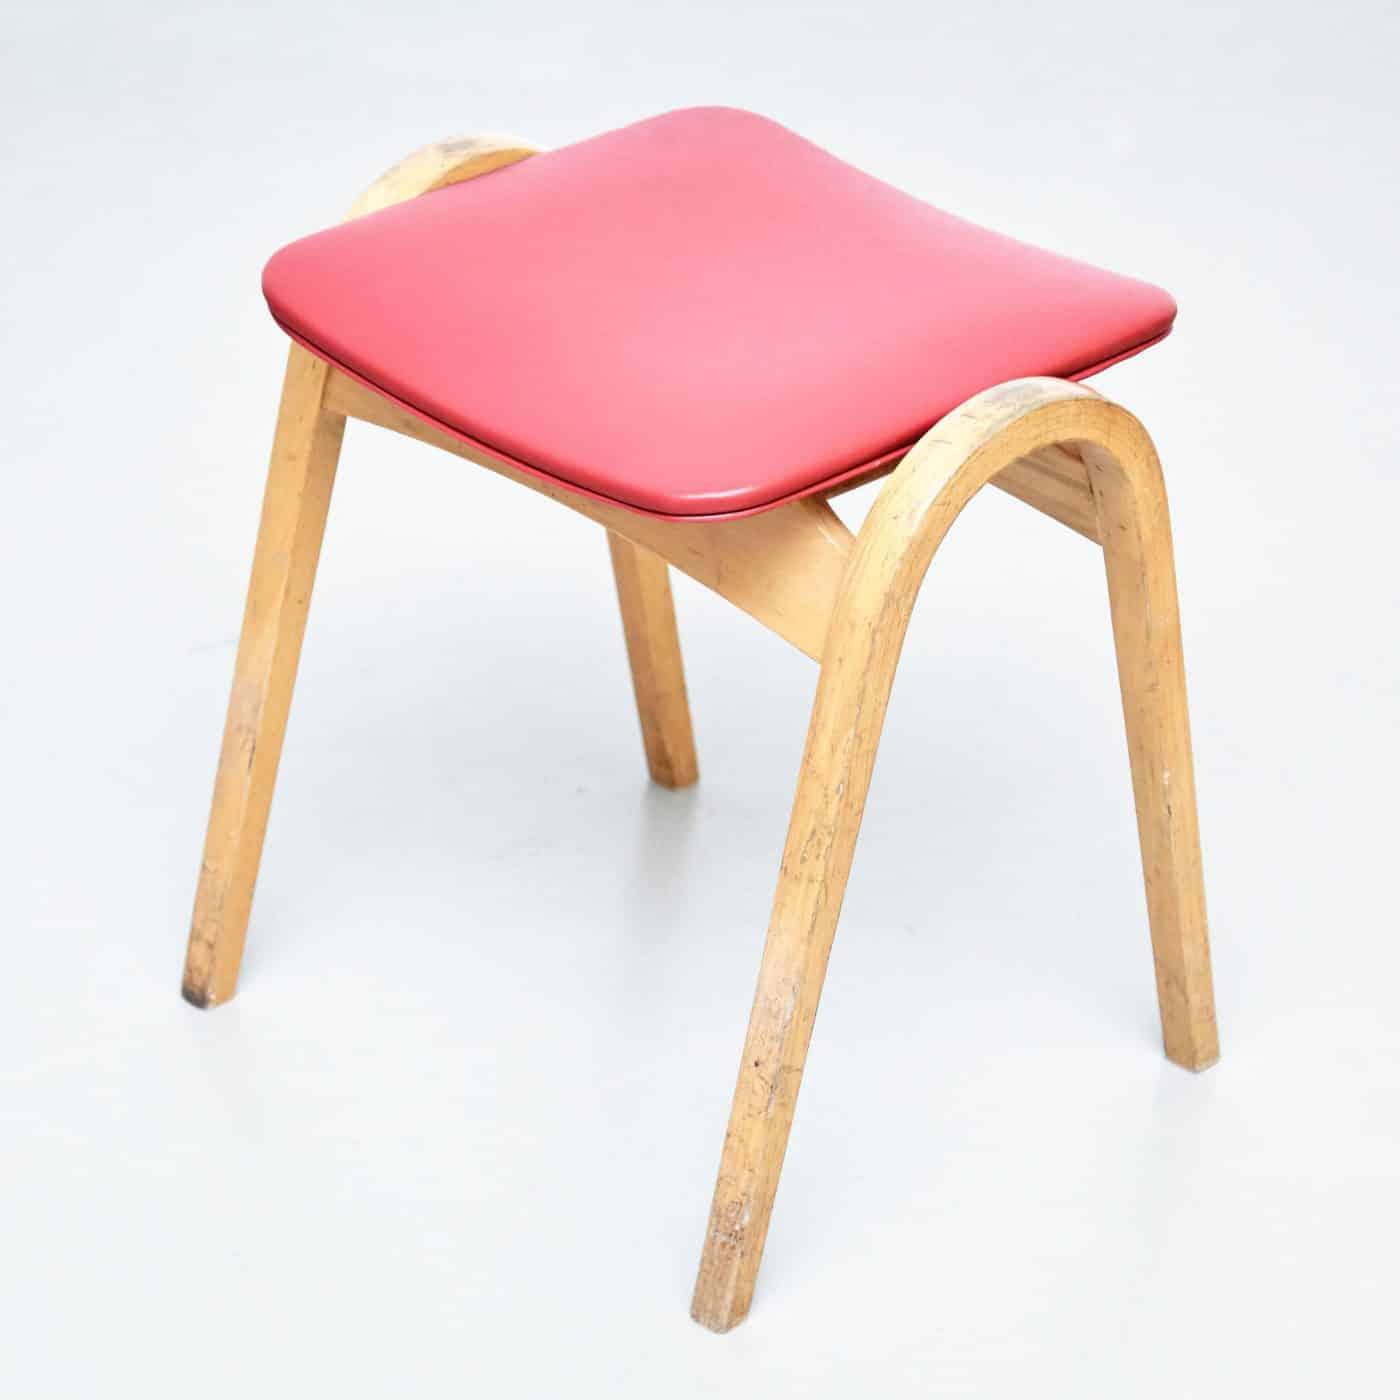 ISAMU KENMOCHI's 1961 wooden STOOL, offered by DADA Studios